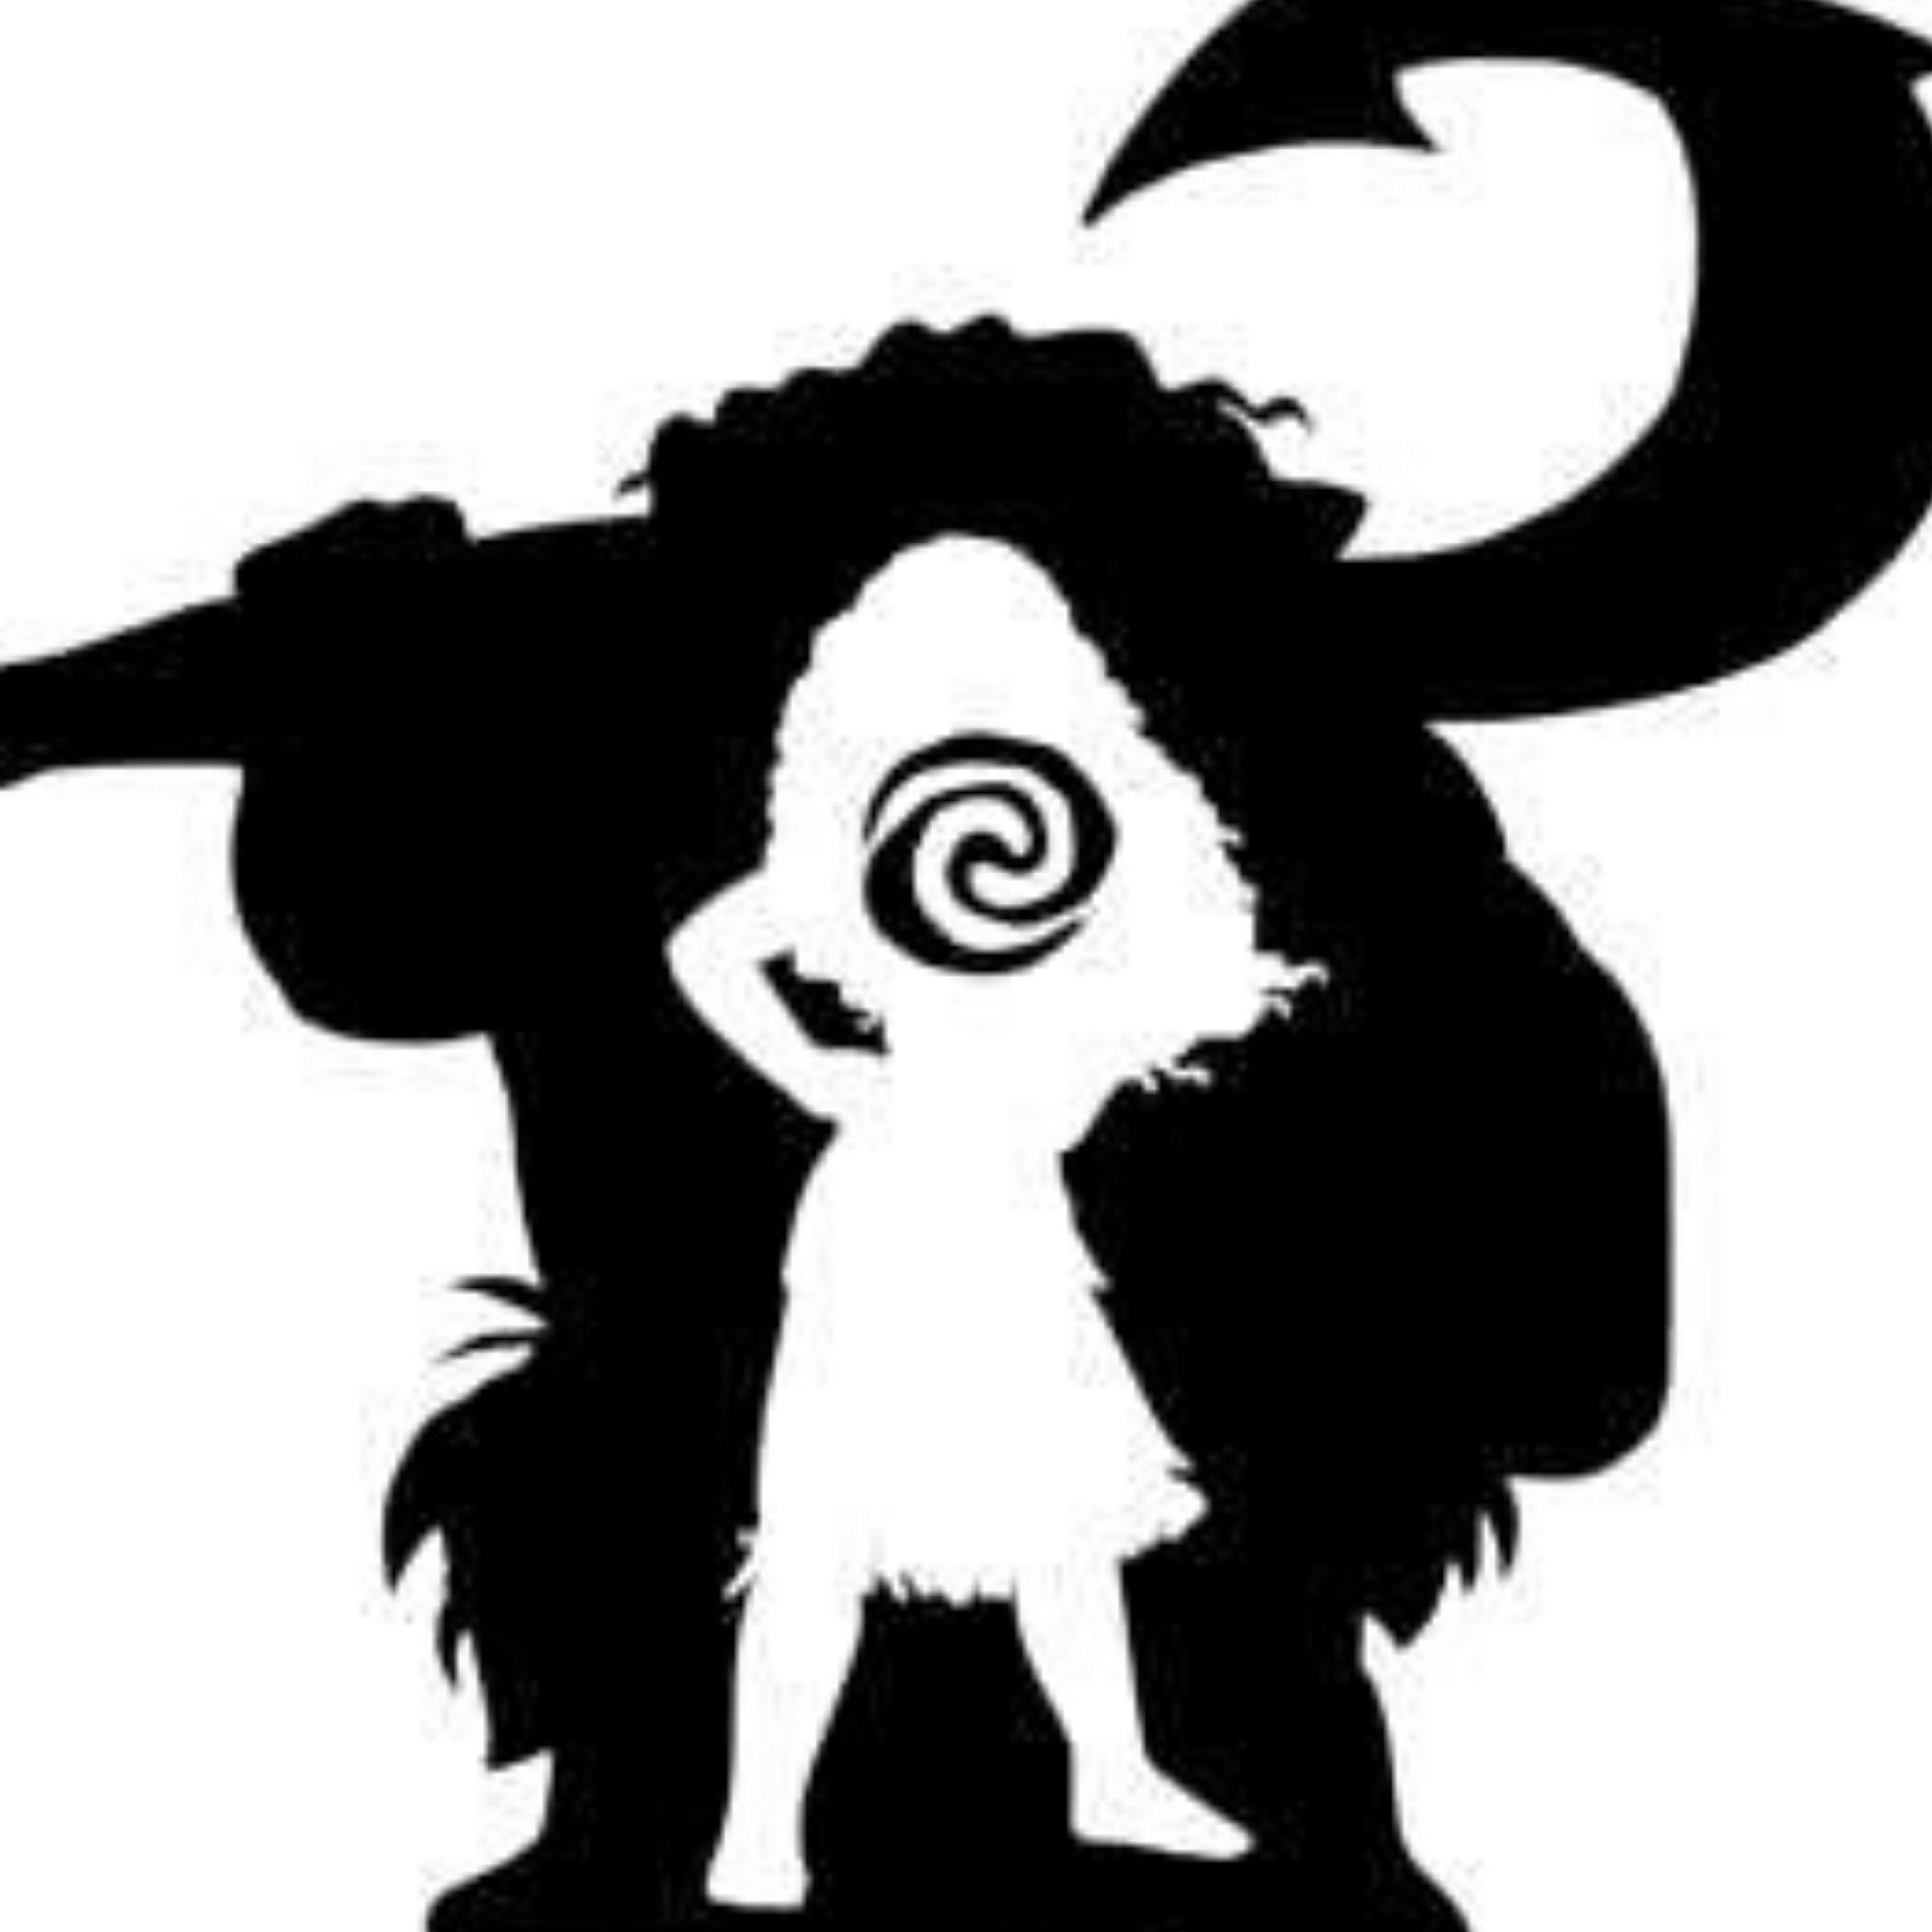 Pin By Olga Nelga On Trolli Minony Moana Monstry Disney Silhouettes Silhouette Art Disney Silhouette [ 2000 x 2000 Pixel ]